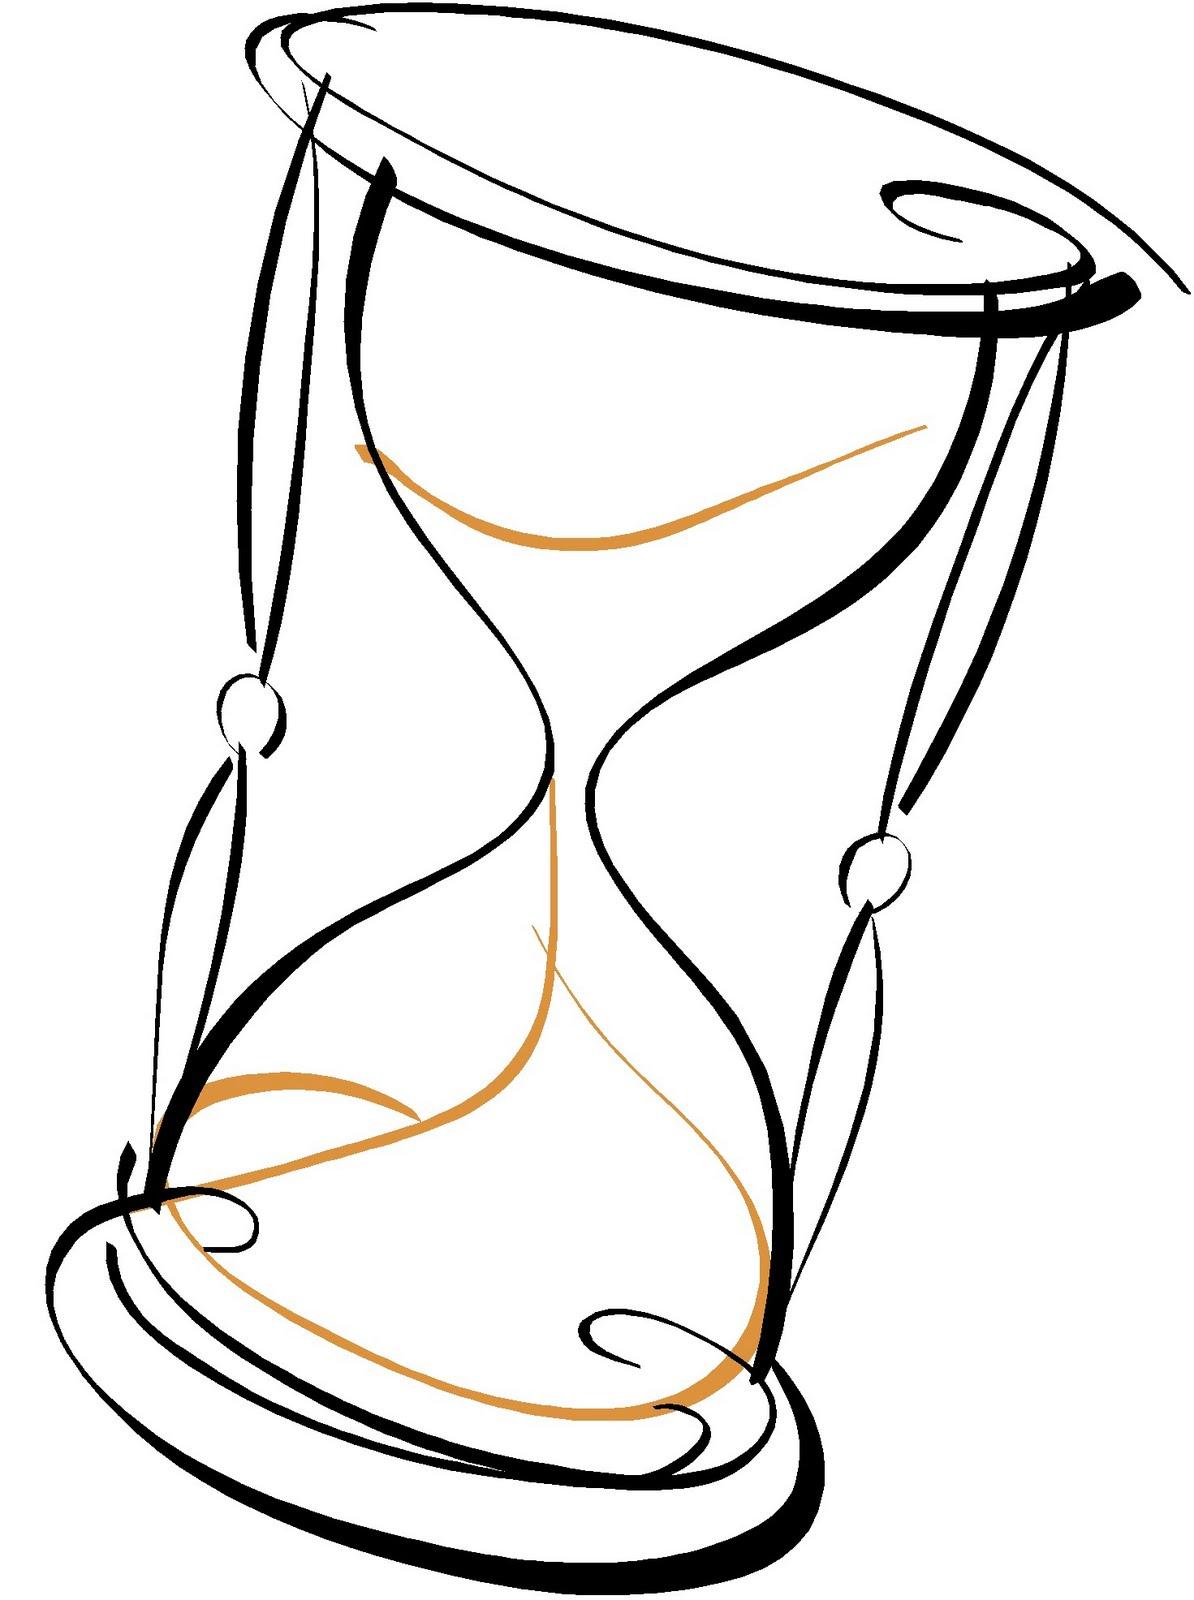 hourglass drawing tumblr traffic club Life Is Like an Hourglass no time no time no time no timehourglass drawing tumblr hourglass